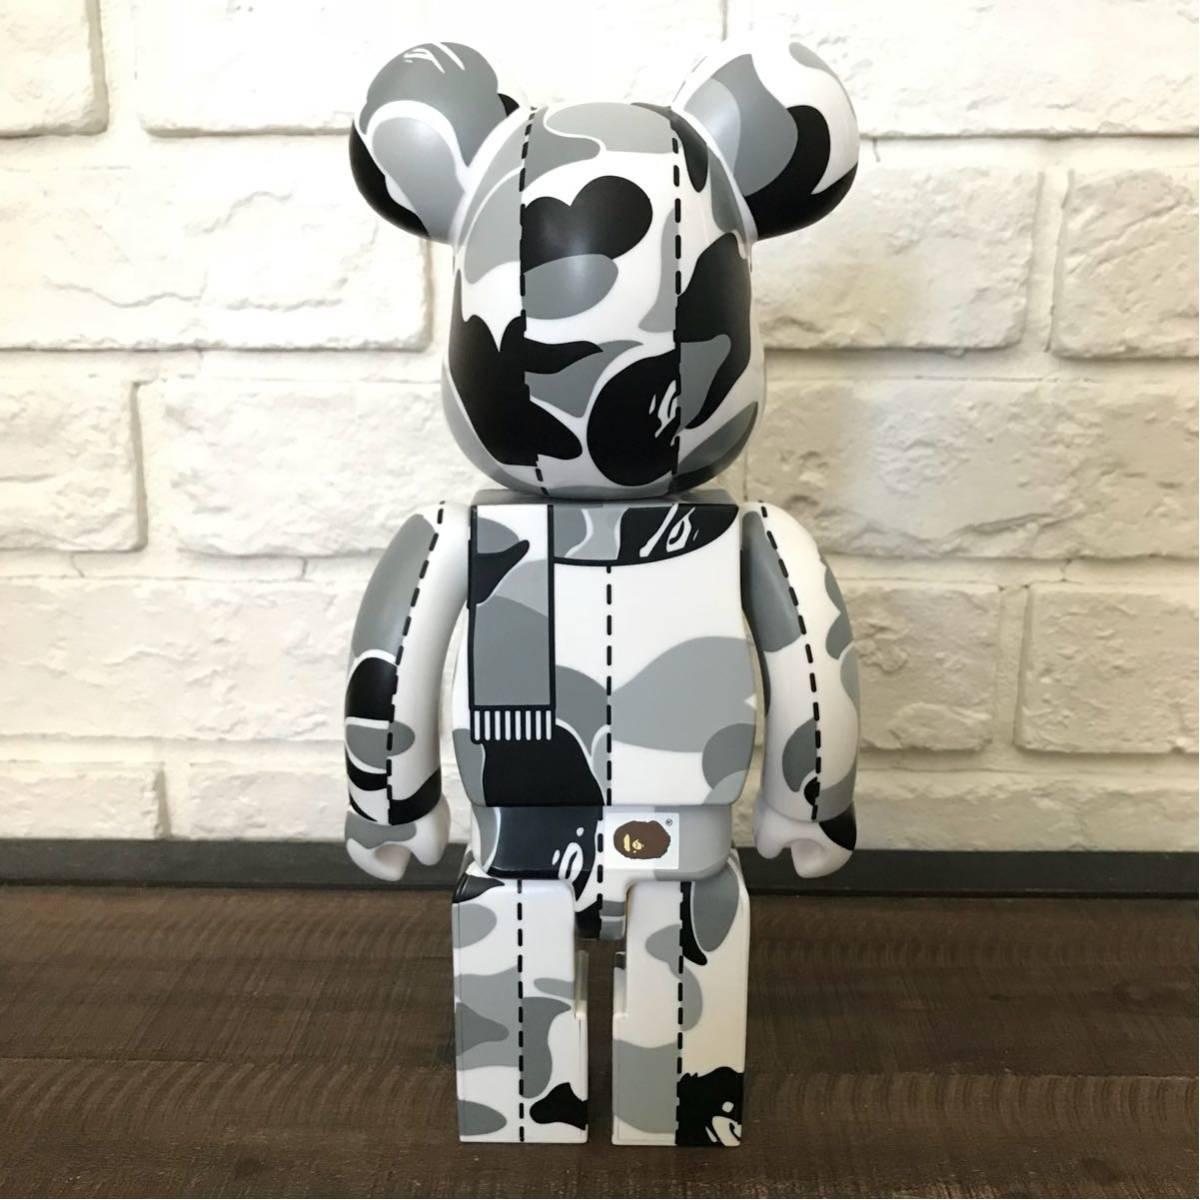 ABC camo 400% BE@RBRICK white medicom toy a bathing ape bape ベアブリック メディコムトイ エイプ ベイプ アベイシングエイプ ABCカモ